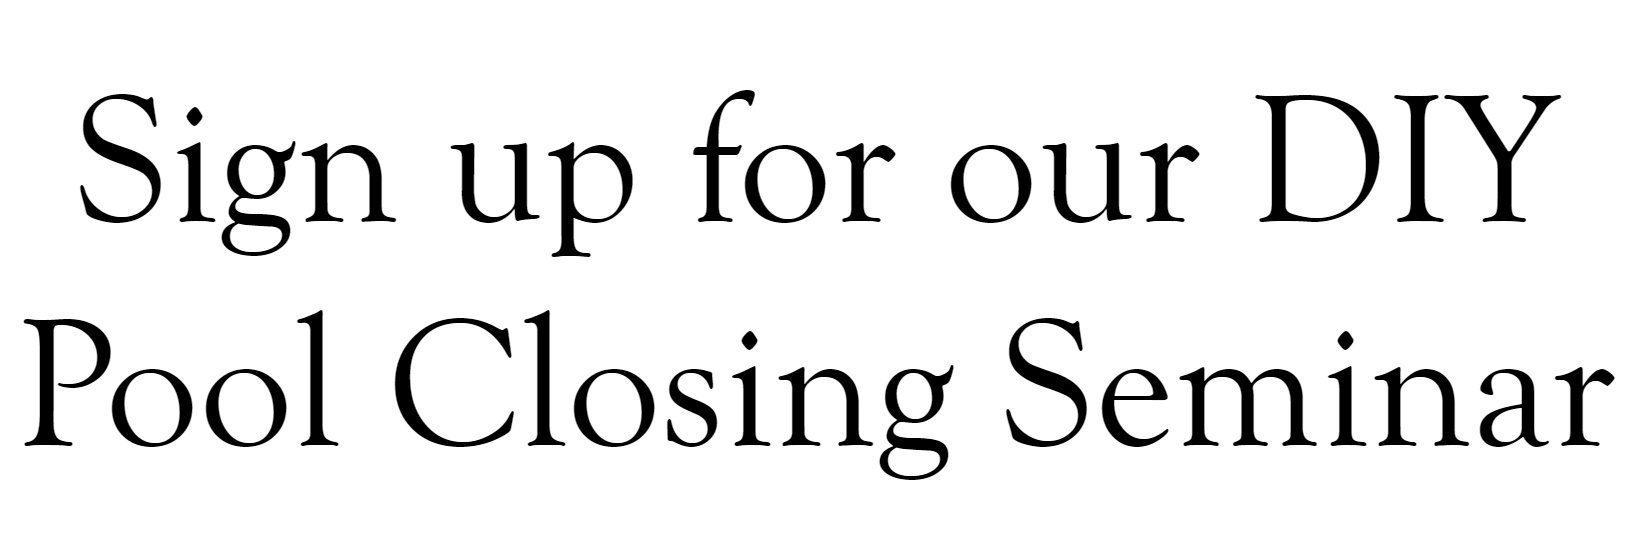 pool-closing-seminar-button-white